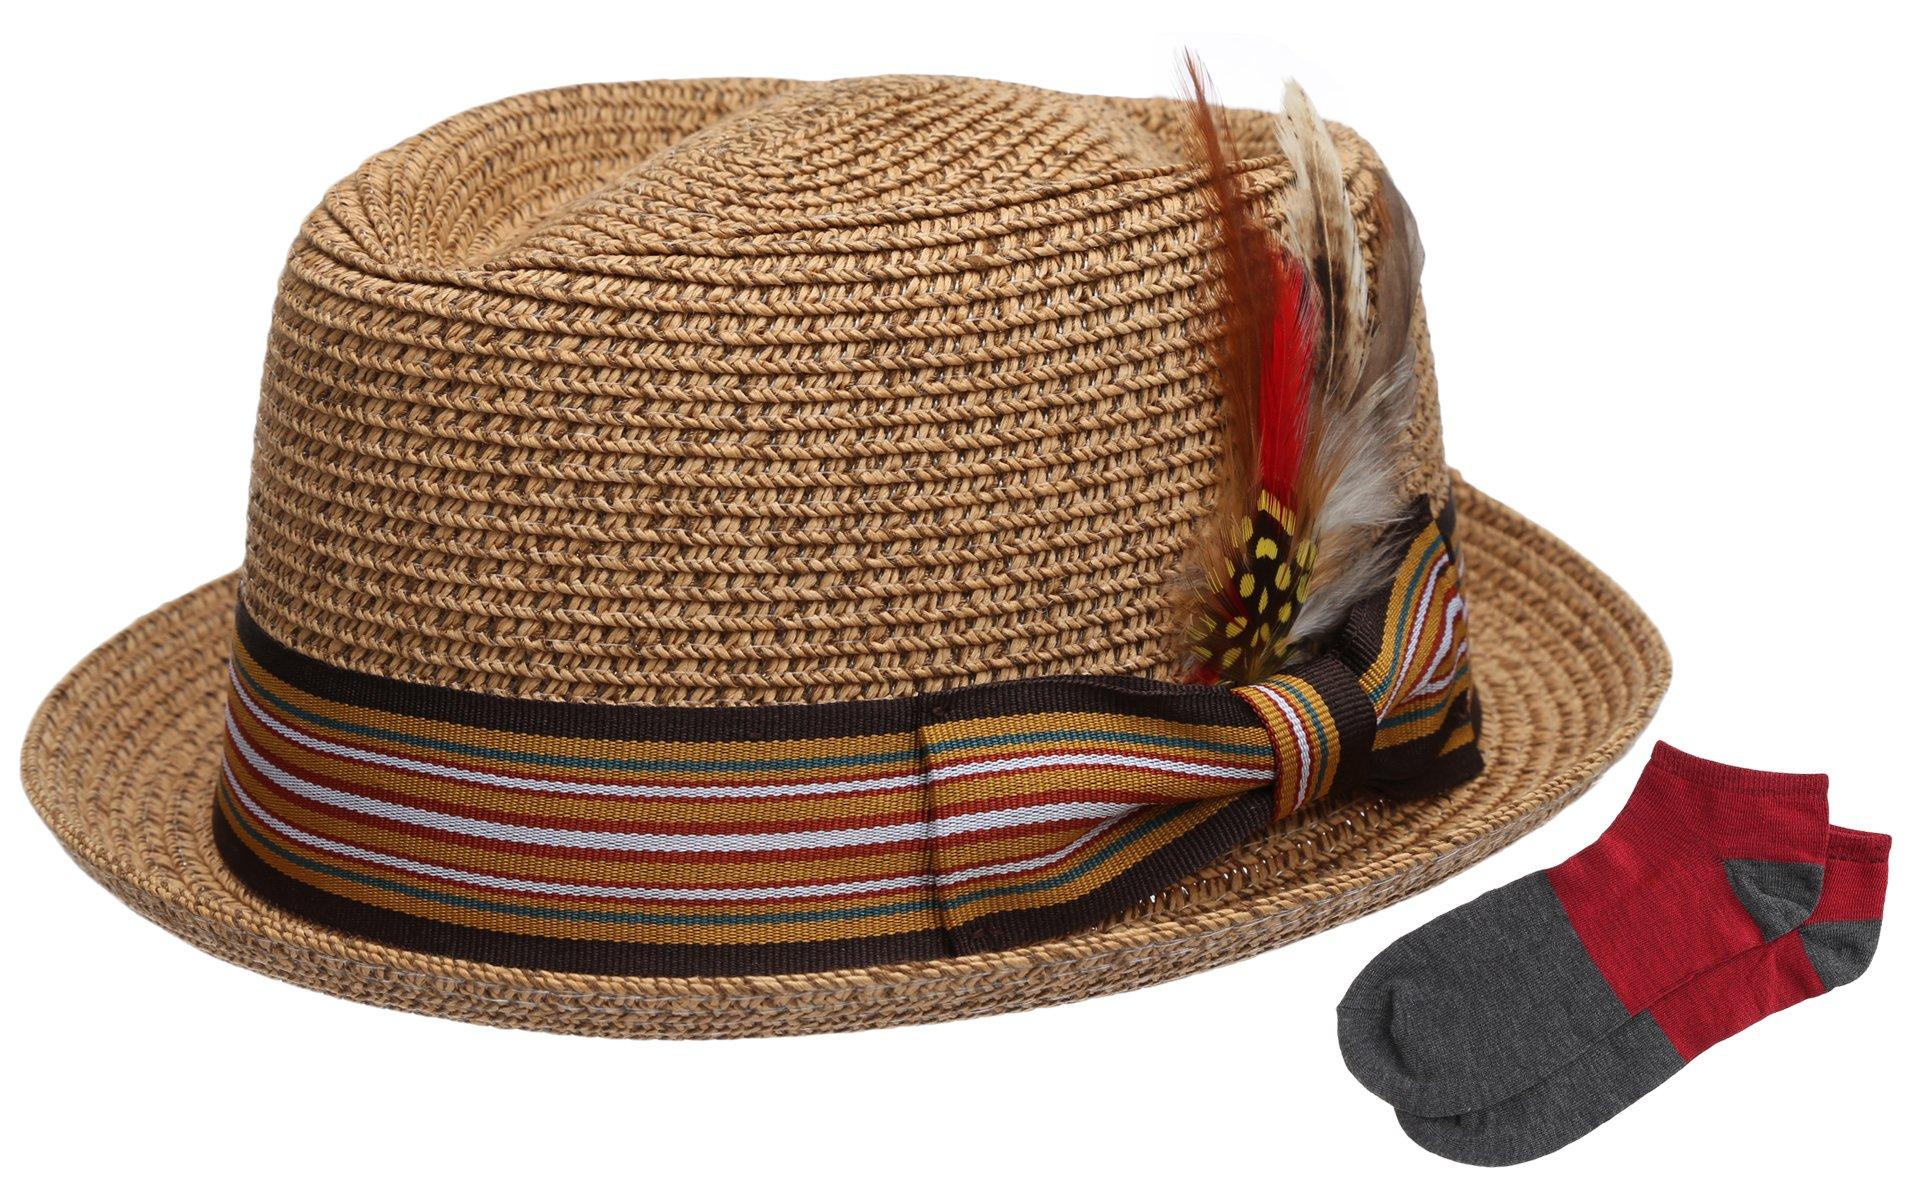 Epoch Men s Premium Straw Porkpie Fedora Hat with Summer Low Cut Sock 8a07b4688848